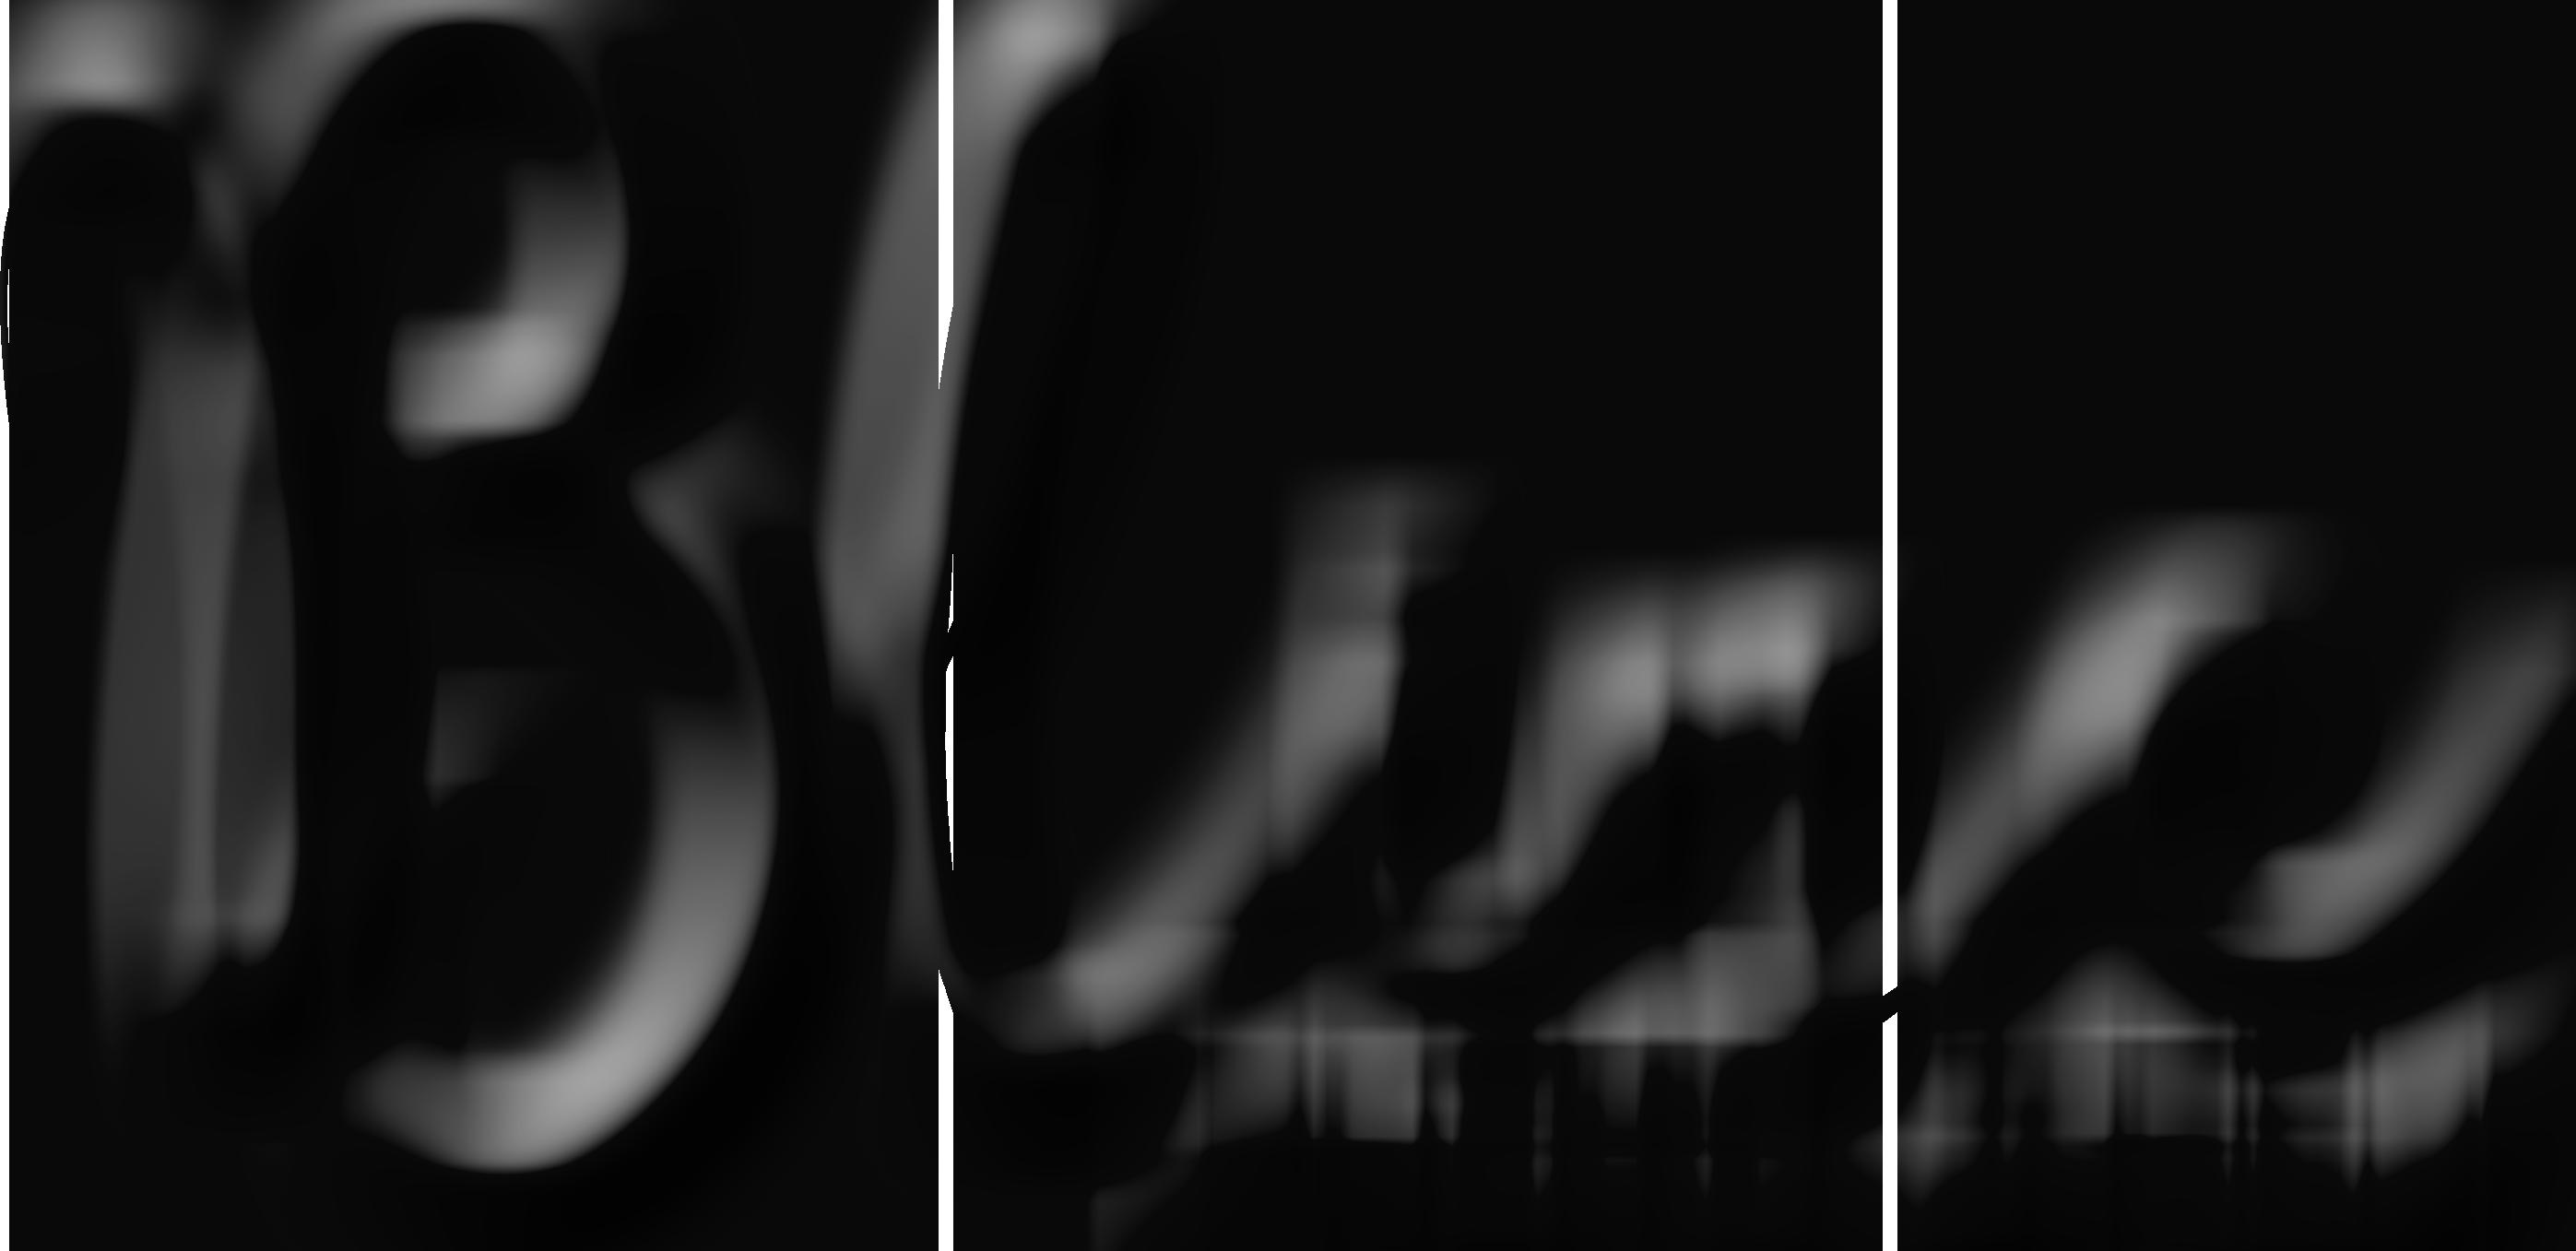 Blinc photo & film